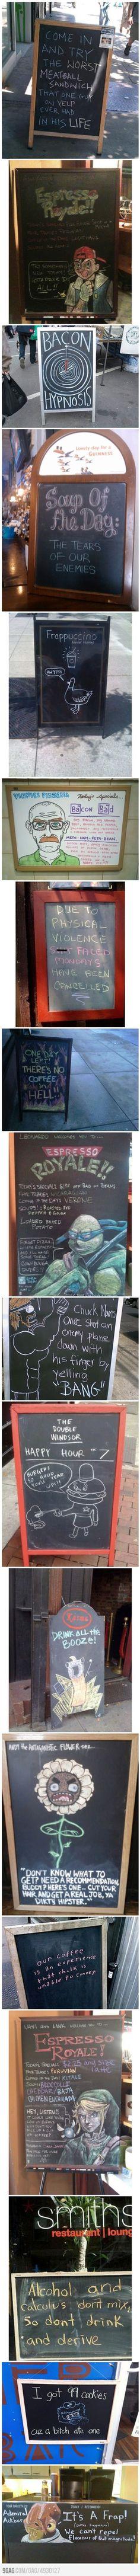 Creative Chalkboard Restaurant/Coffee House Signs